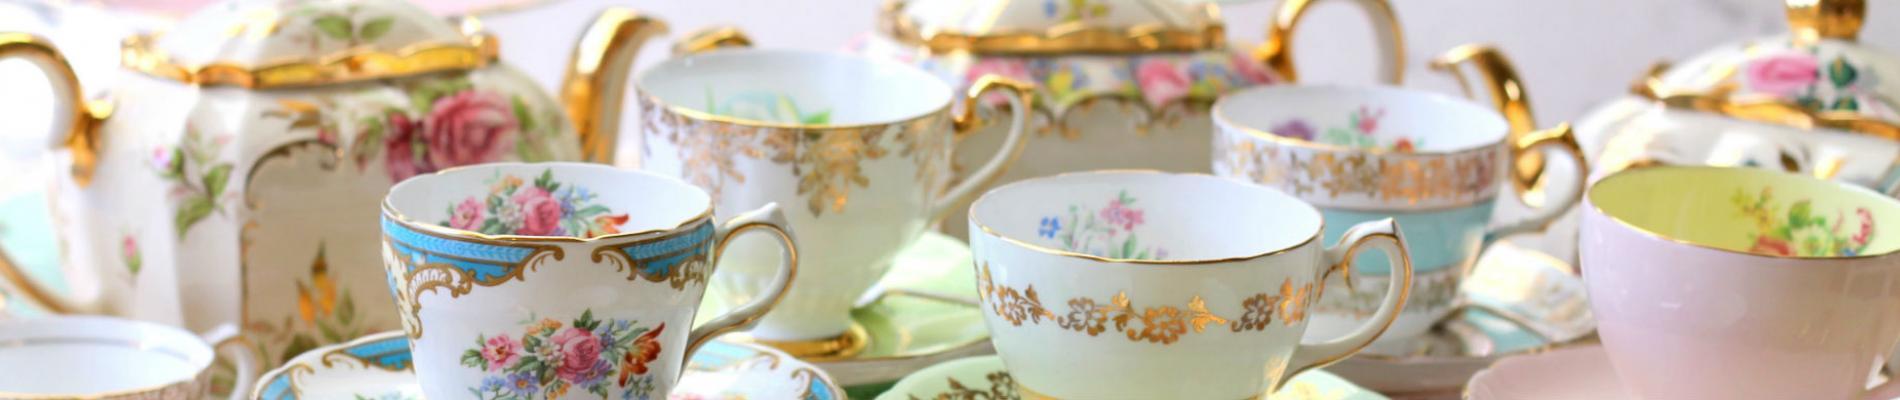 Holiday Afternoon Royal Tea